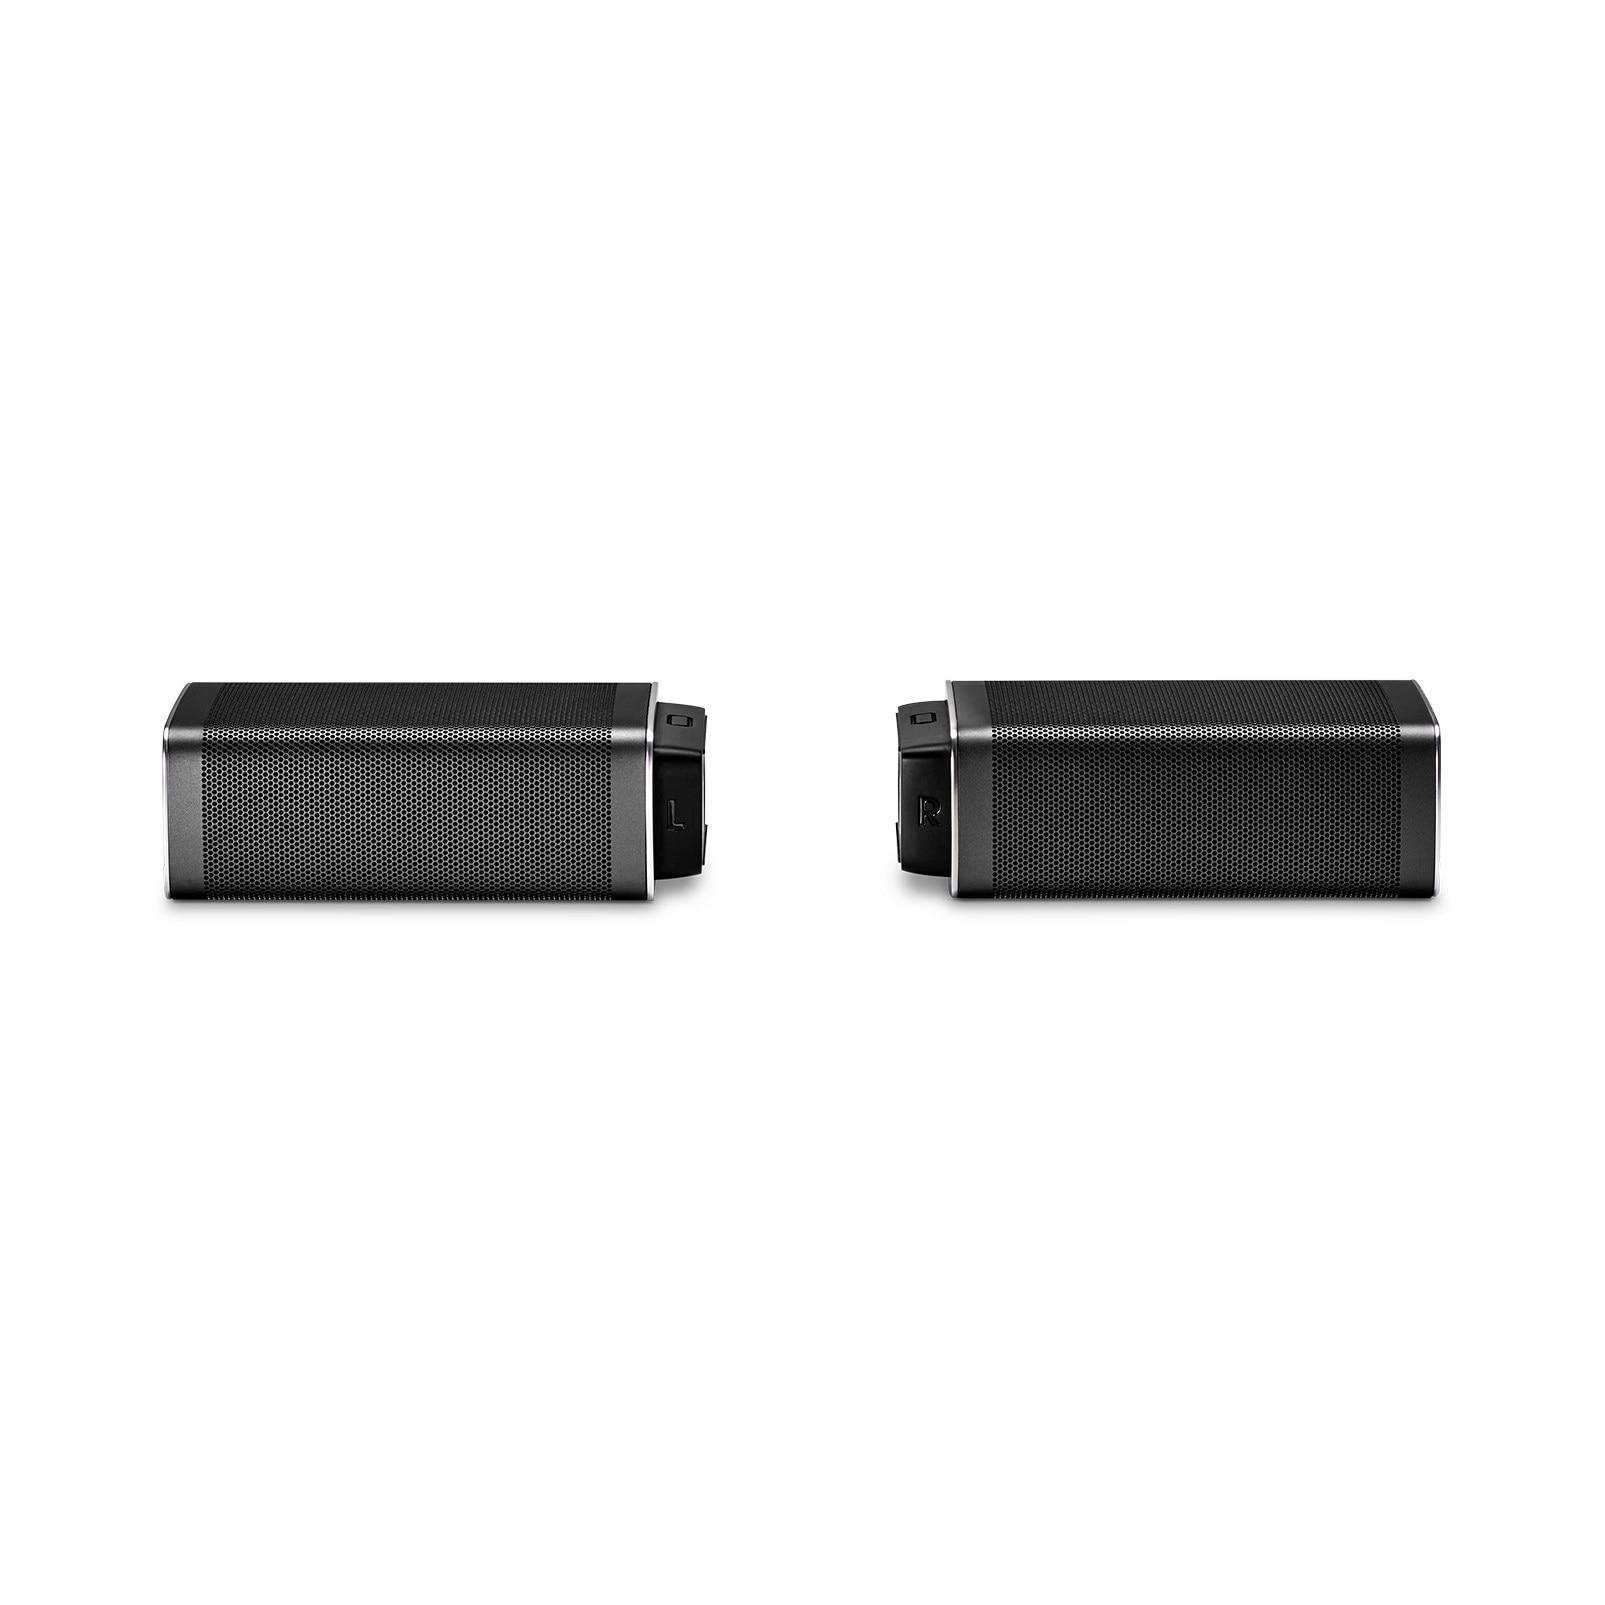 JBL 5.1 Soundbar with Wireless Subwoofer